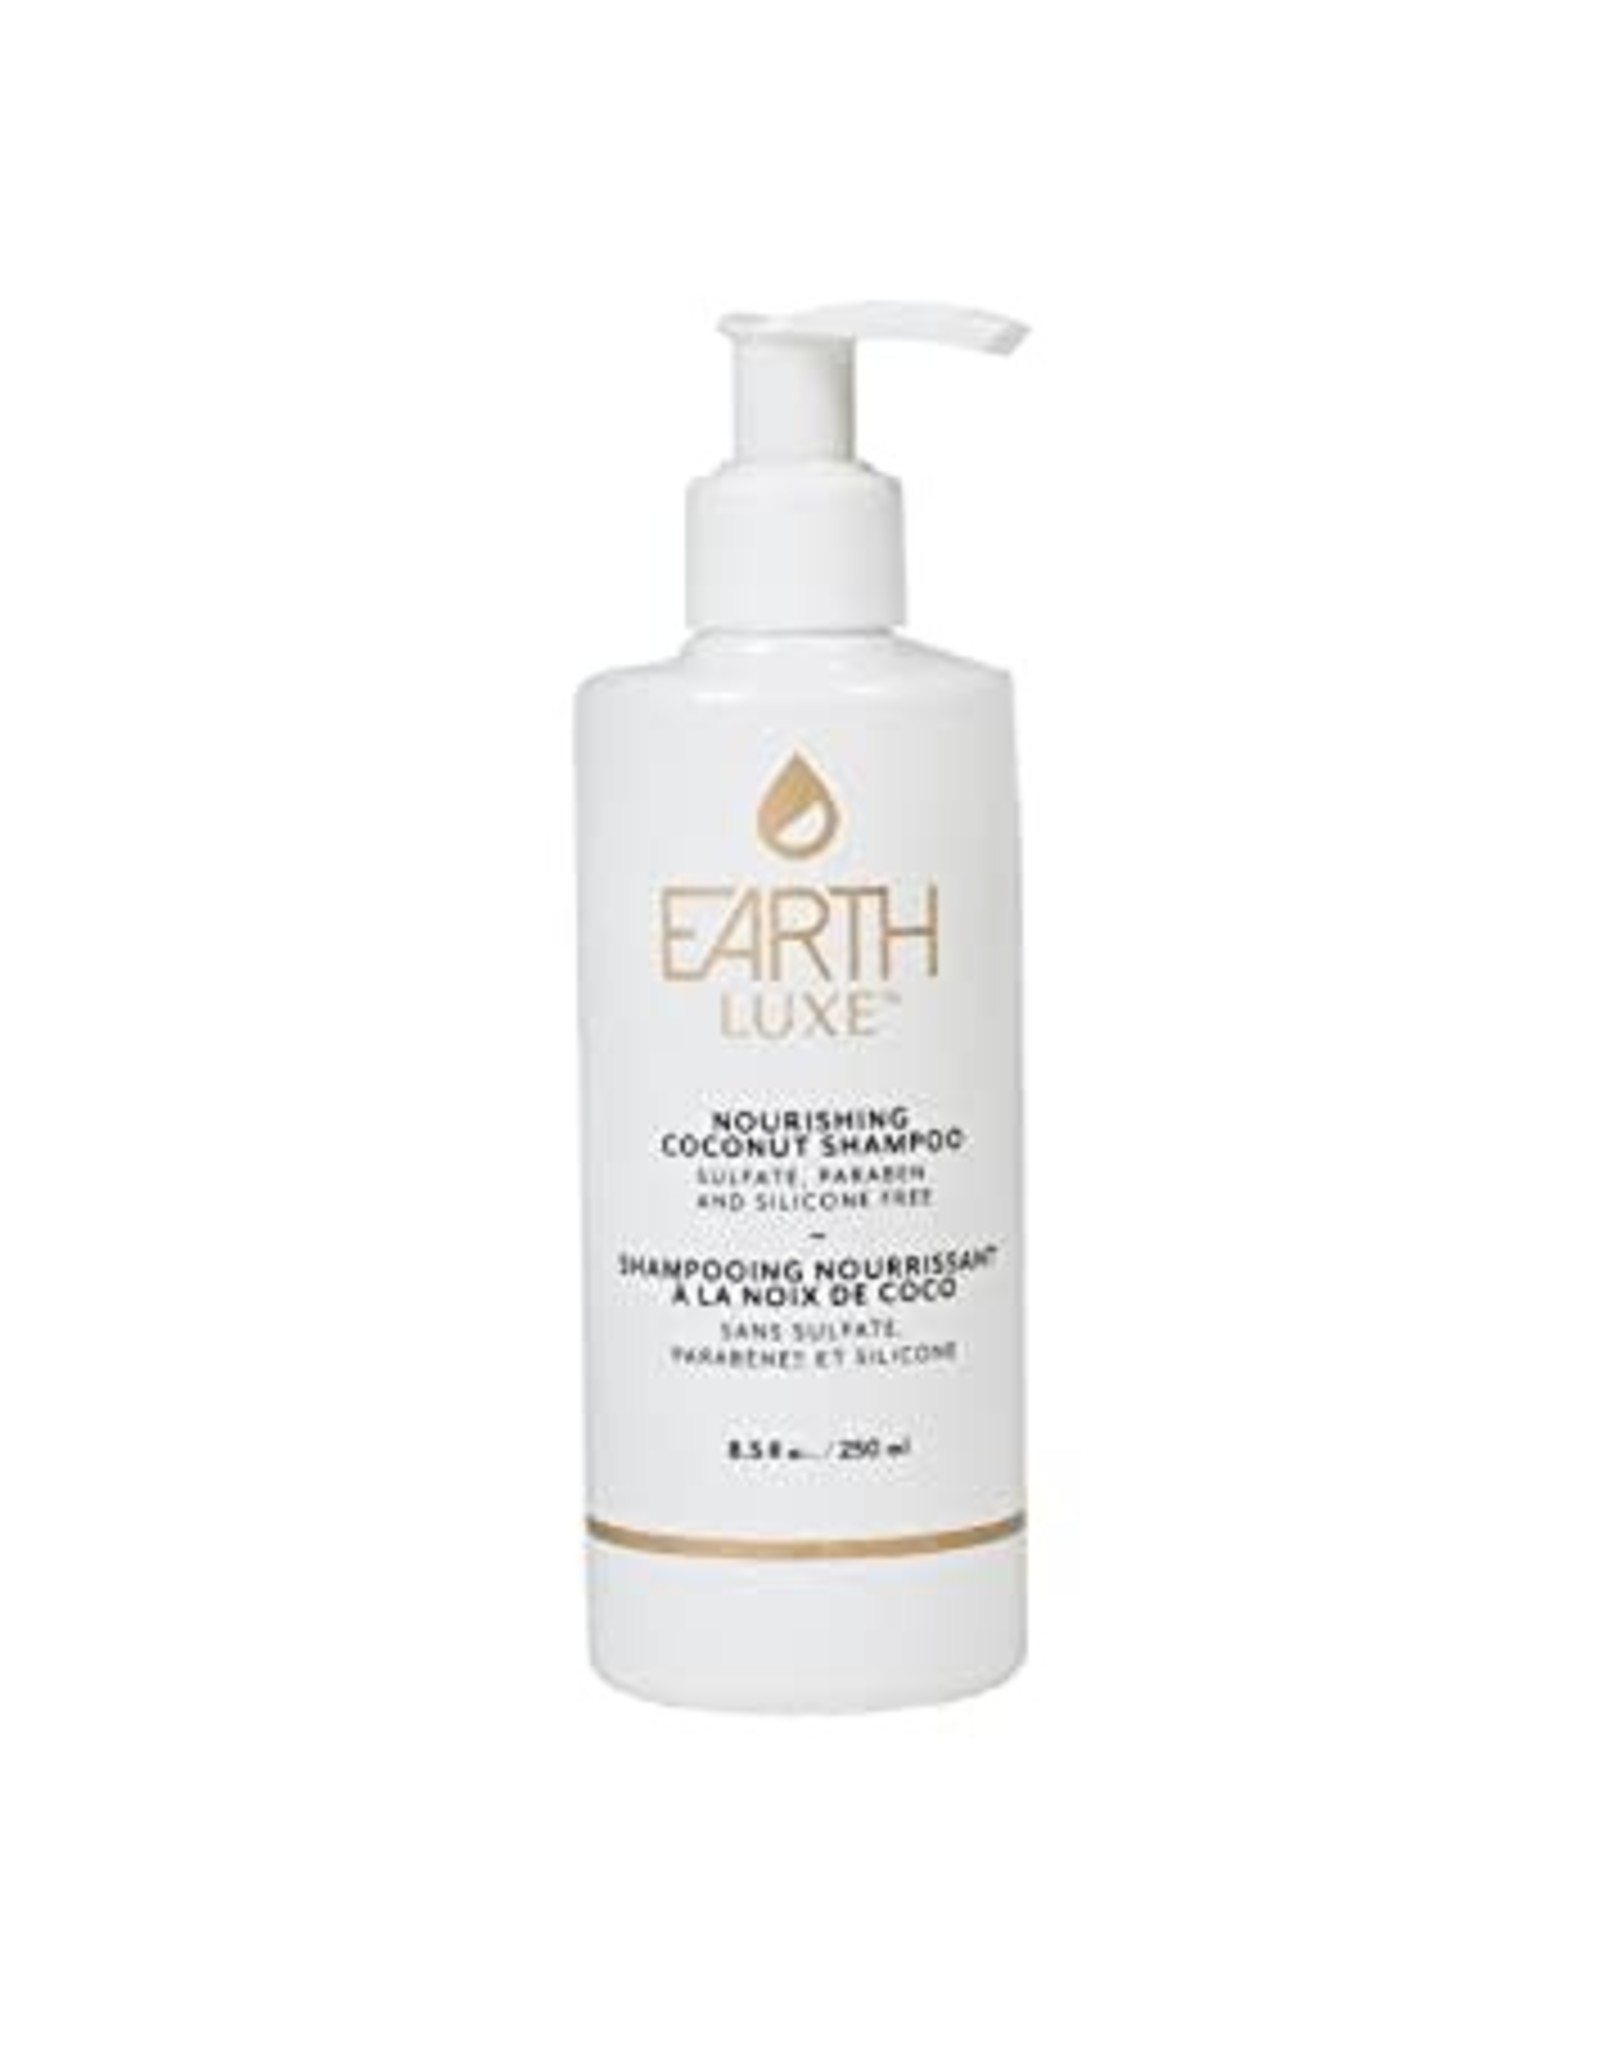 Earth Luxe Shampoo Coconut